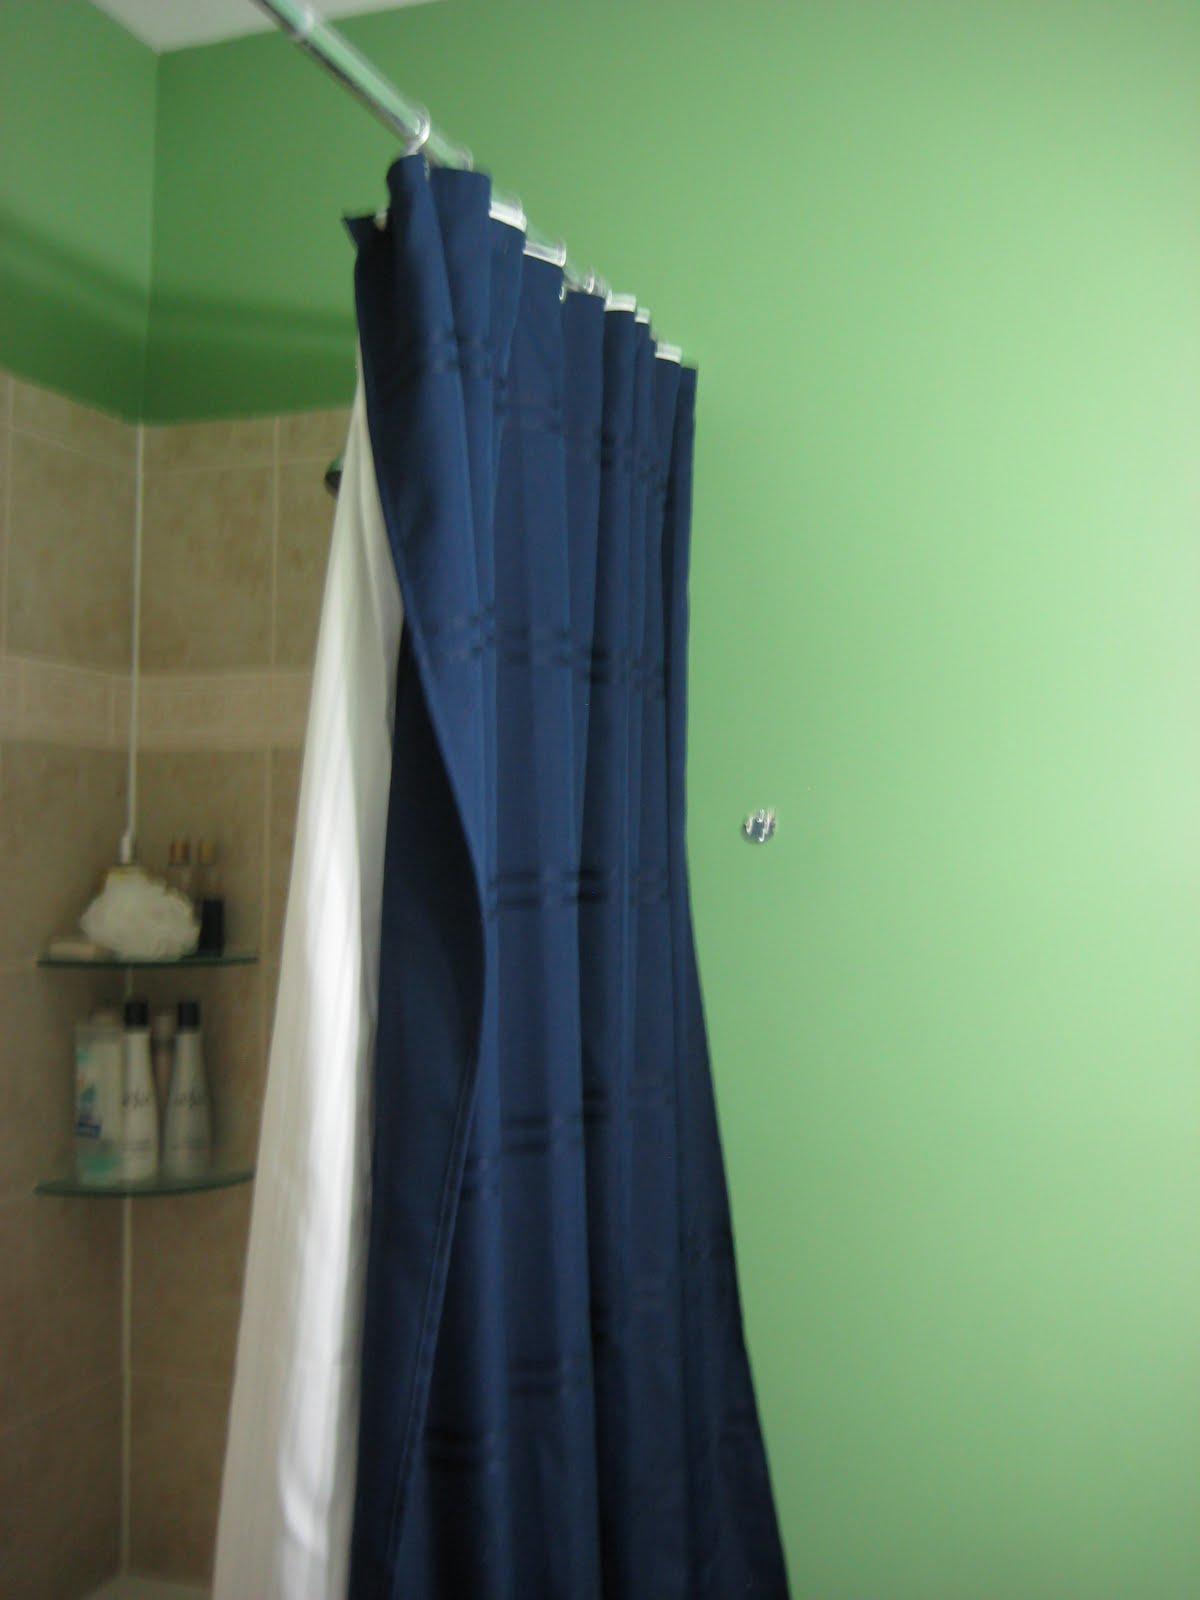 Our Washington Life Green Bathroom Help